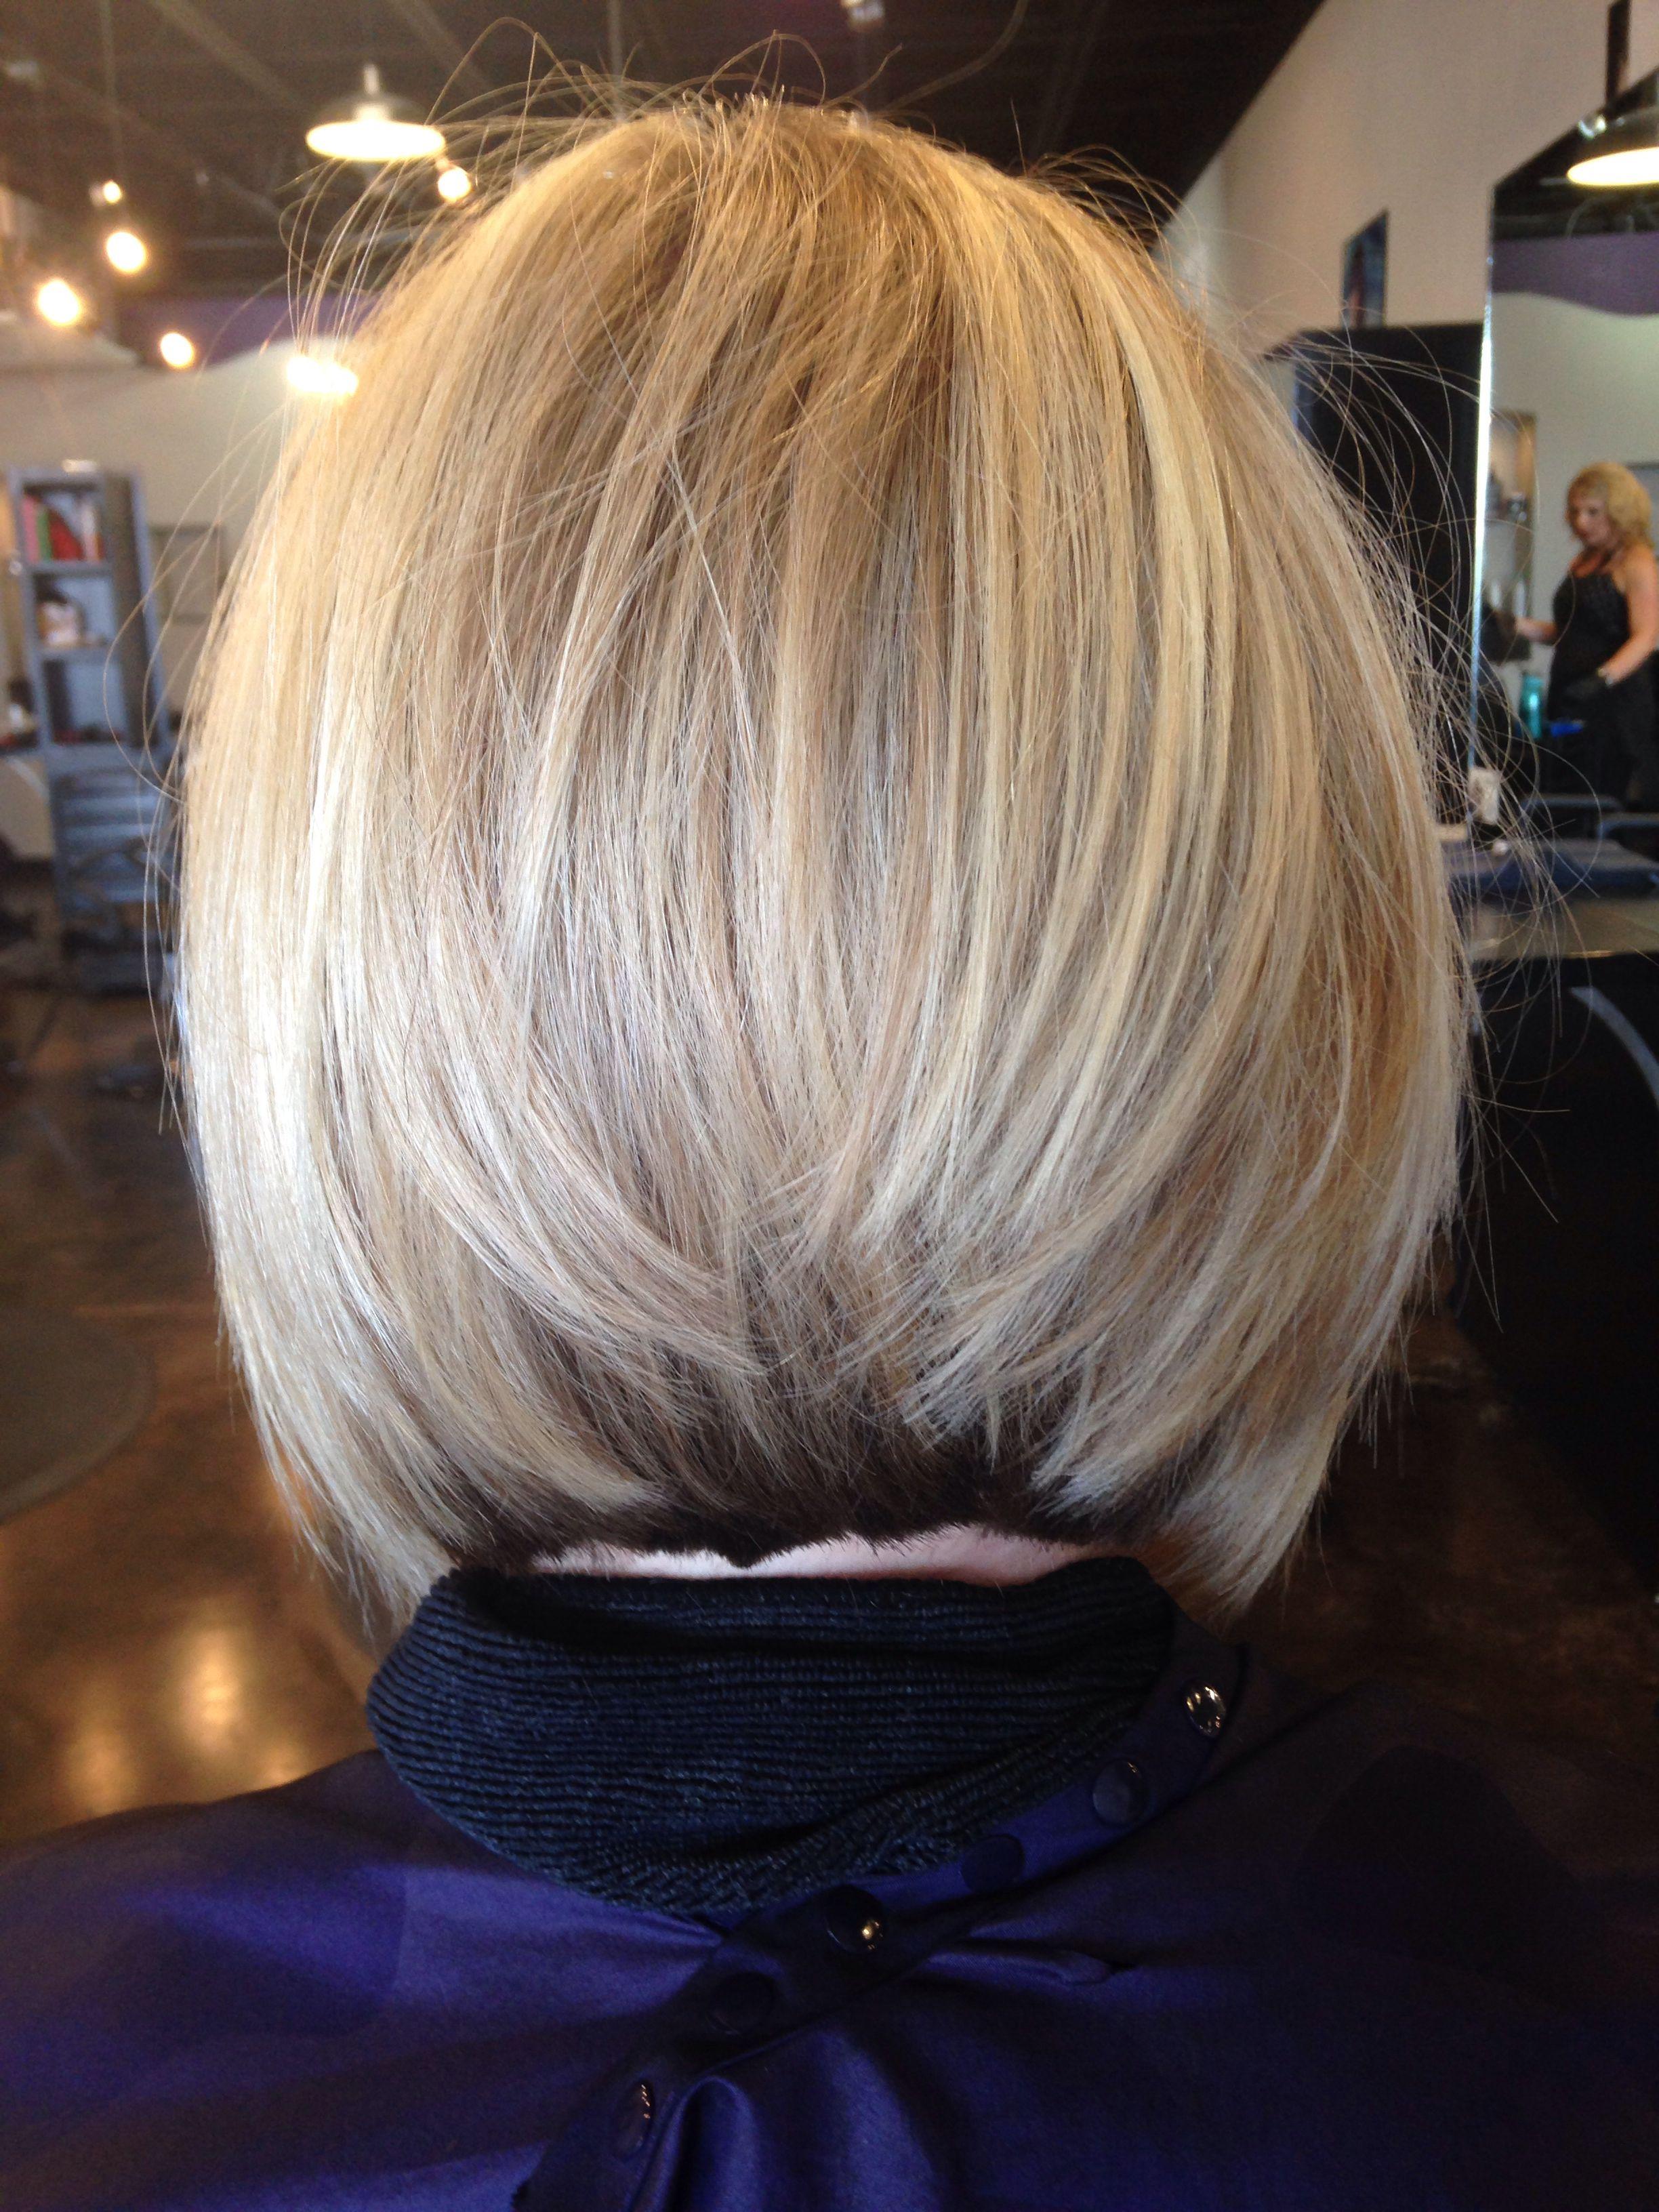 Blond inverted stacked bob Short Hair Pinterest